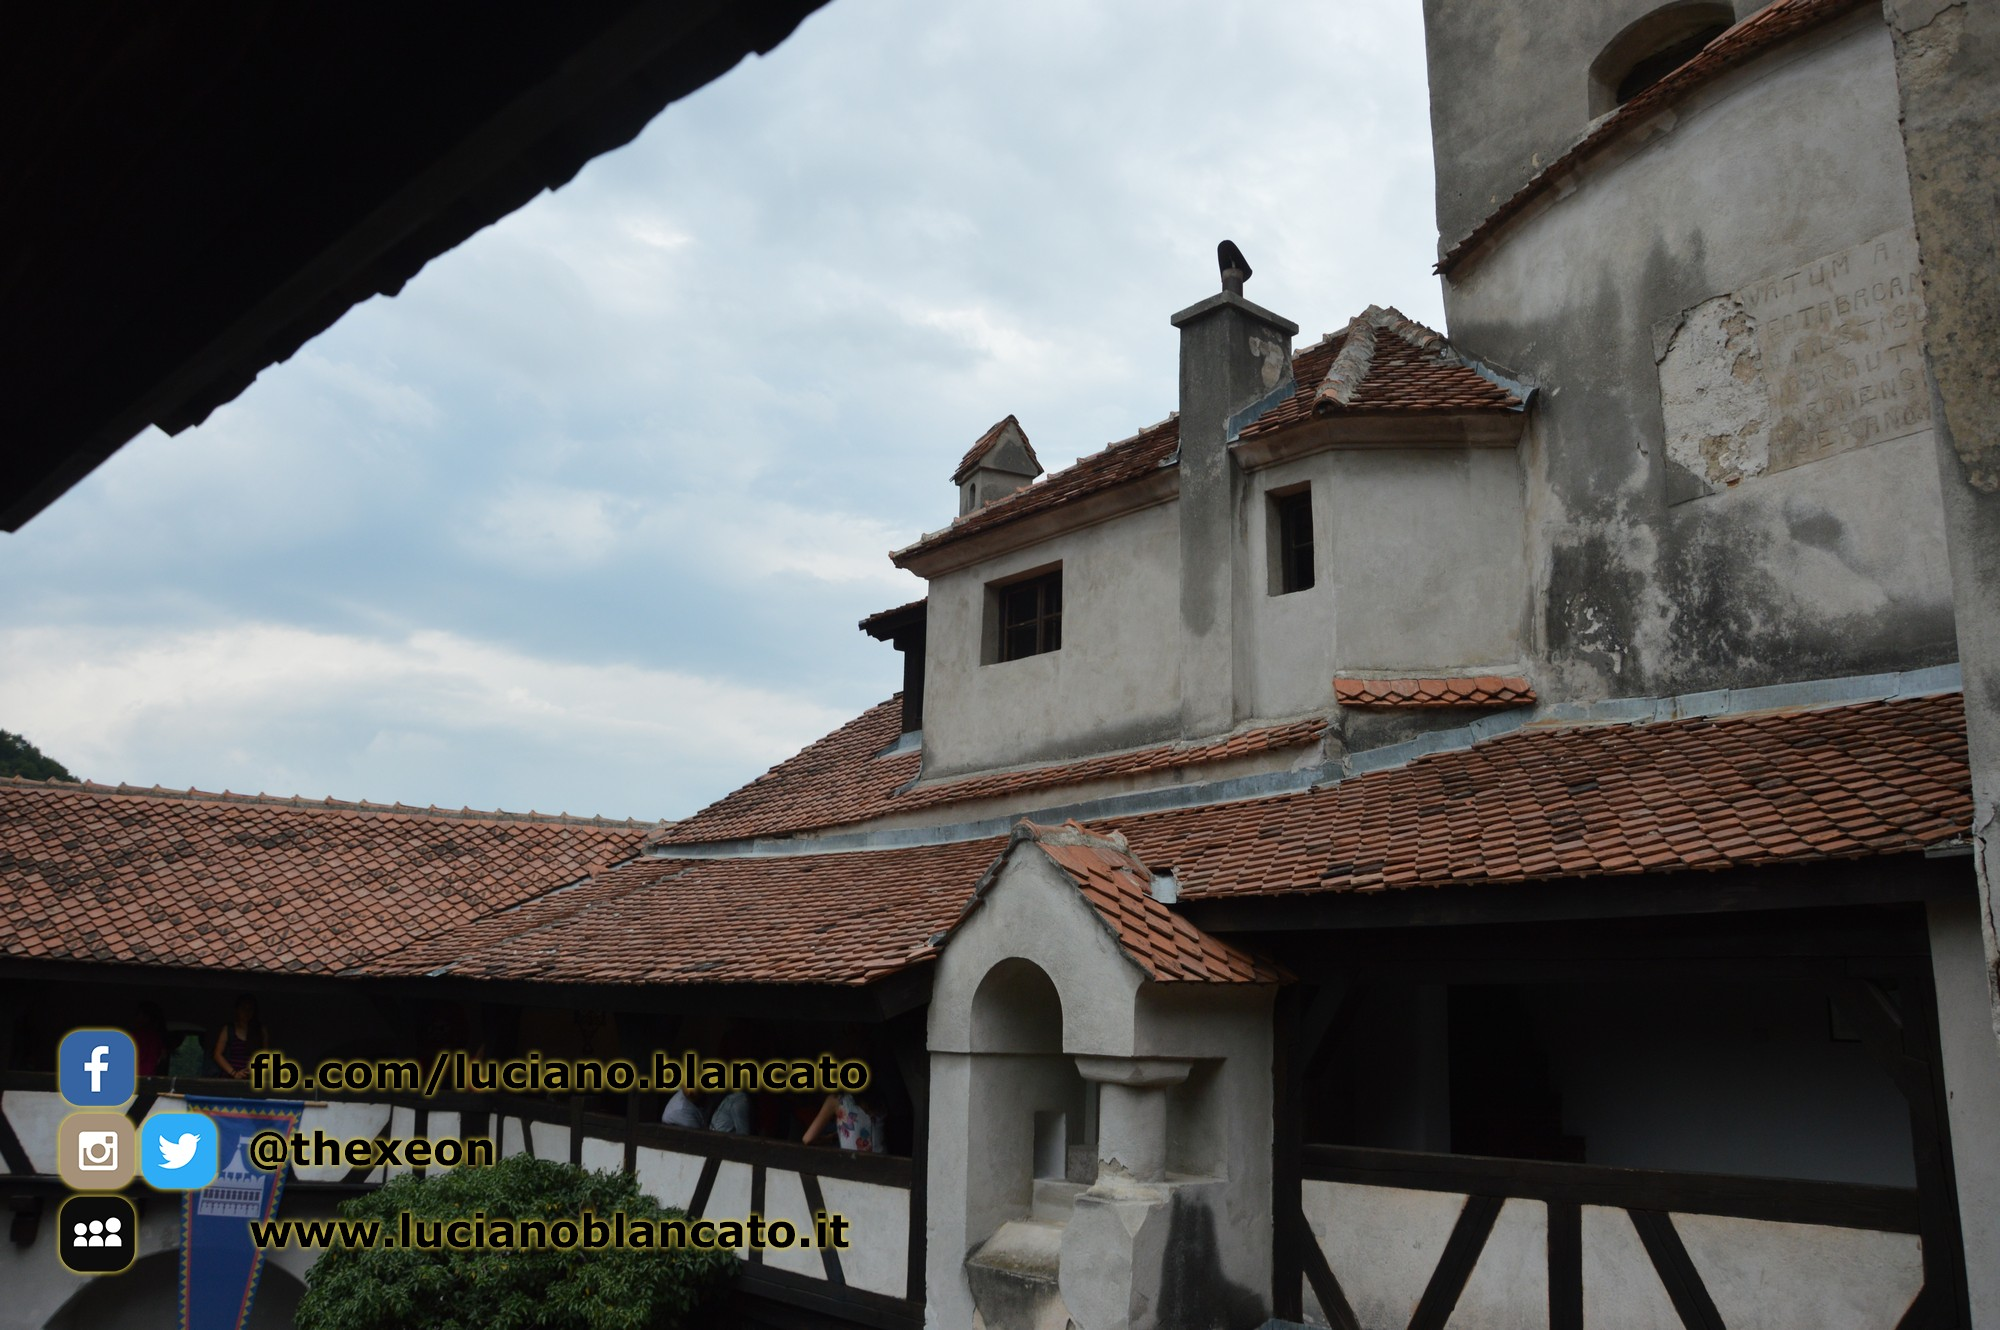 Bucarest - Castello di Bran - Viste interne/cortile